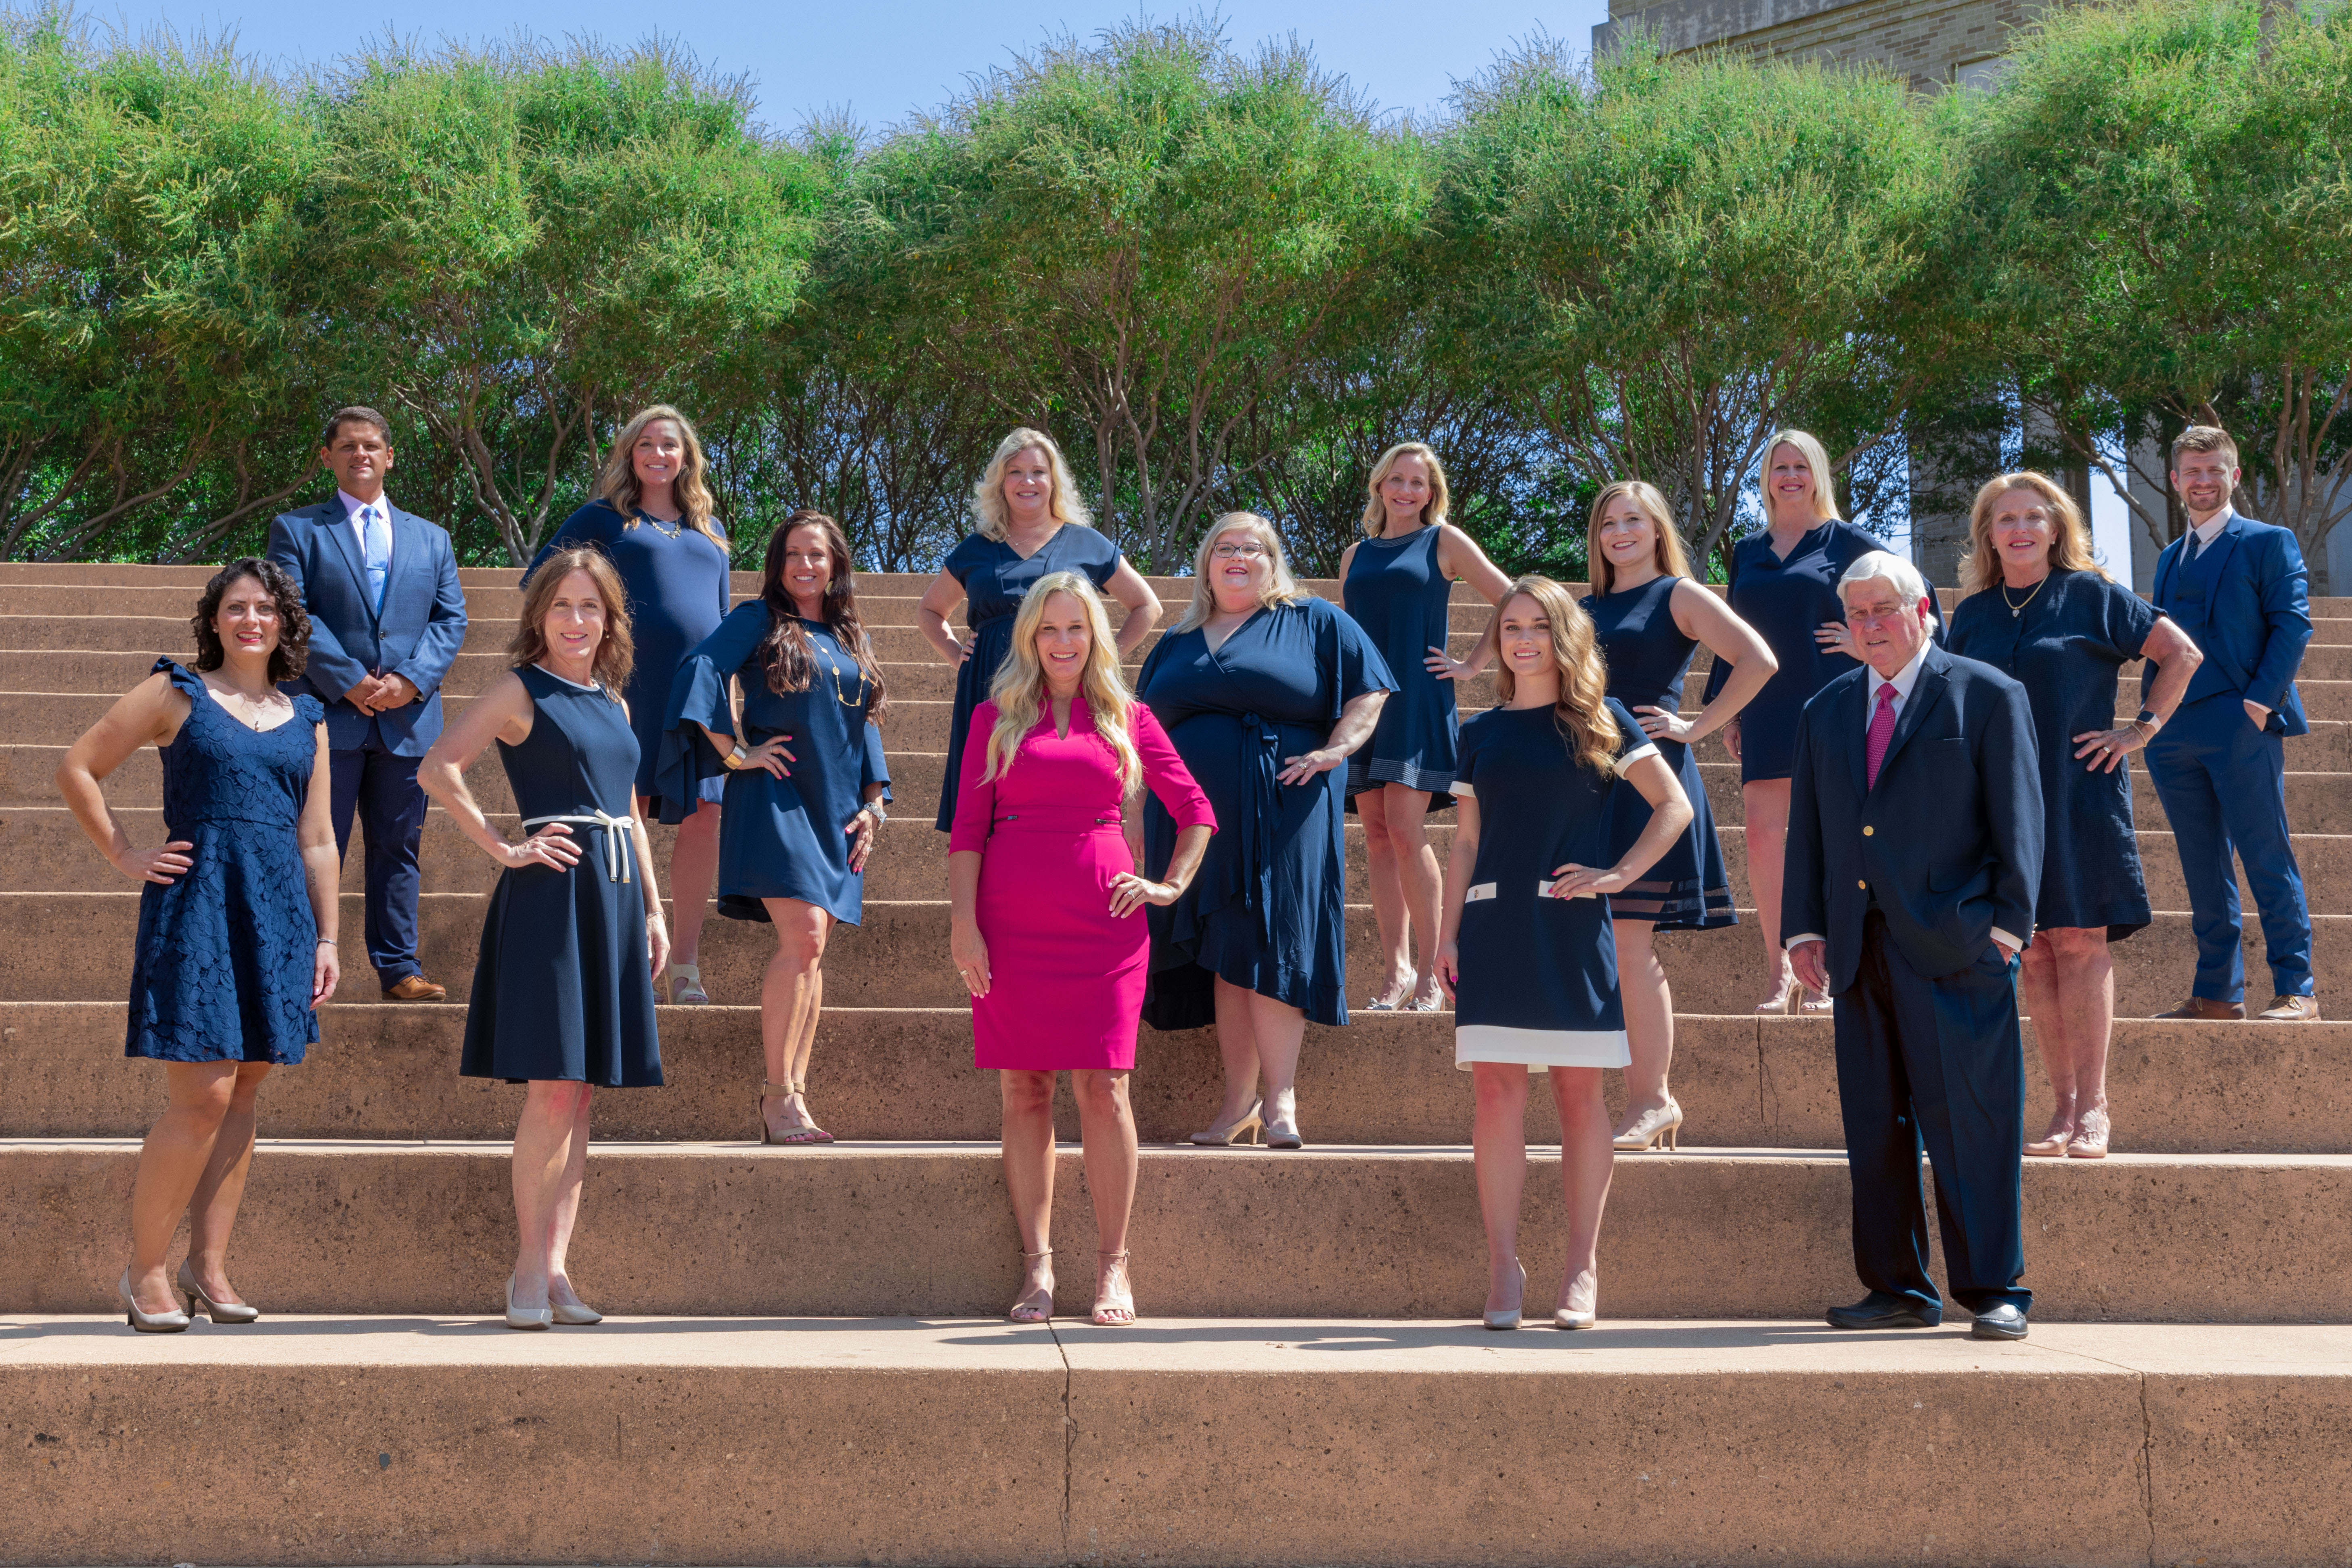 A photo of the Tonya Harbin Real Estate Team